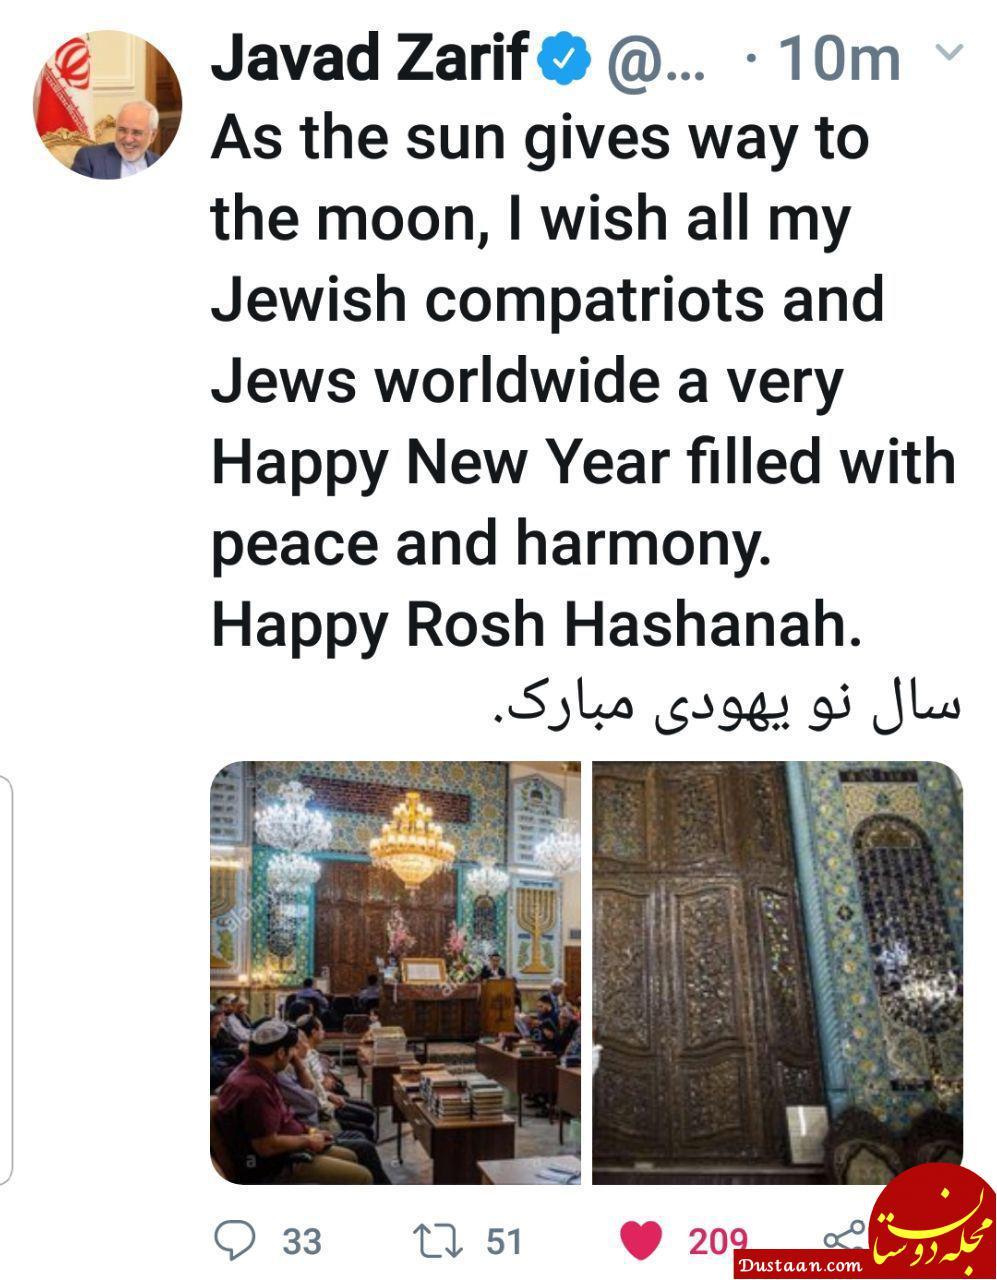 www.dustaan.com ظریف سال نوی یهودی را تبریک گفت +عکس